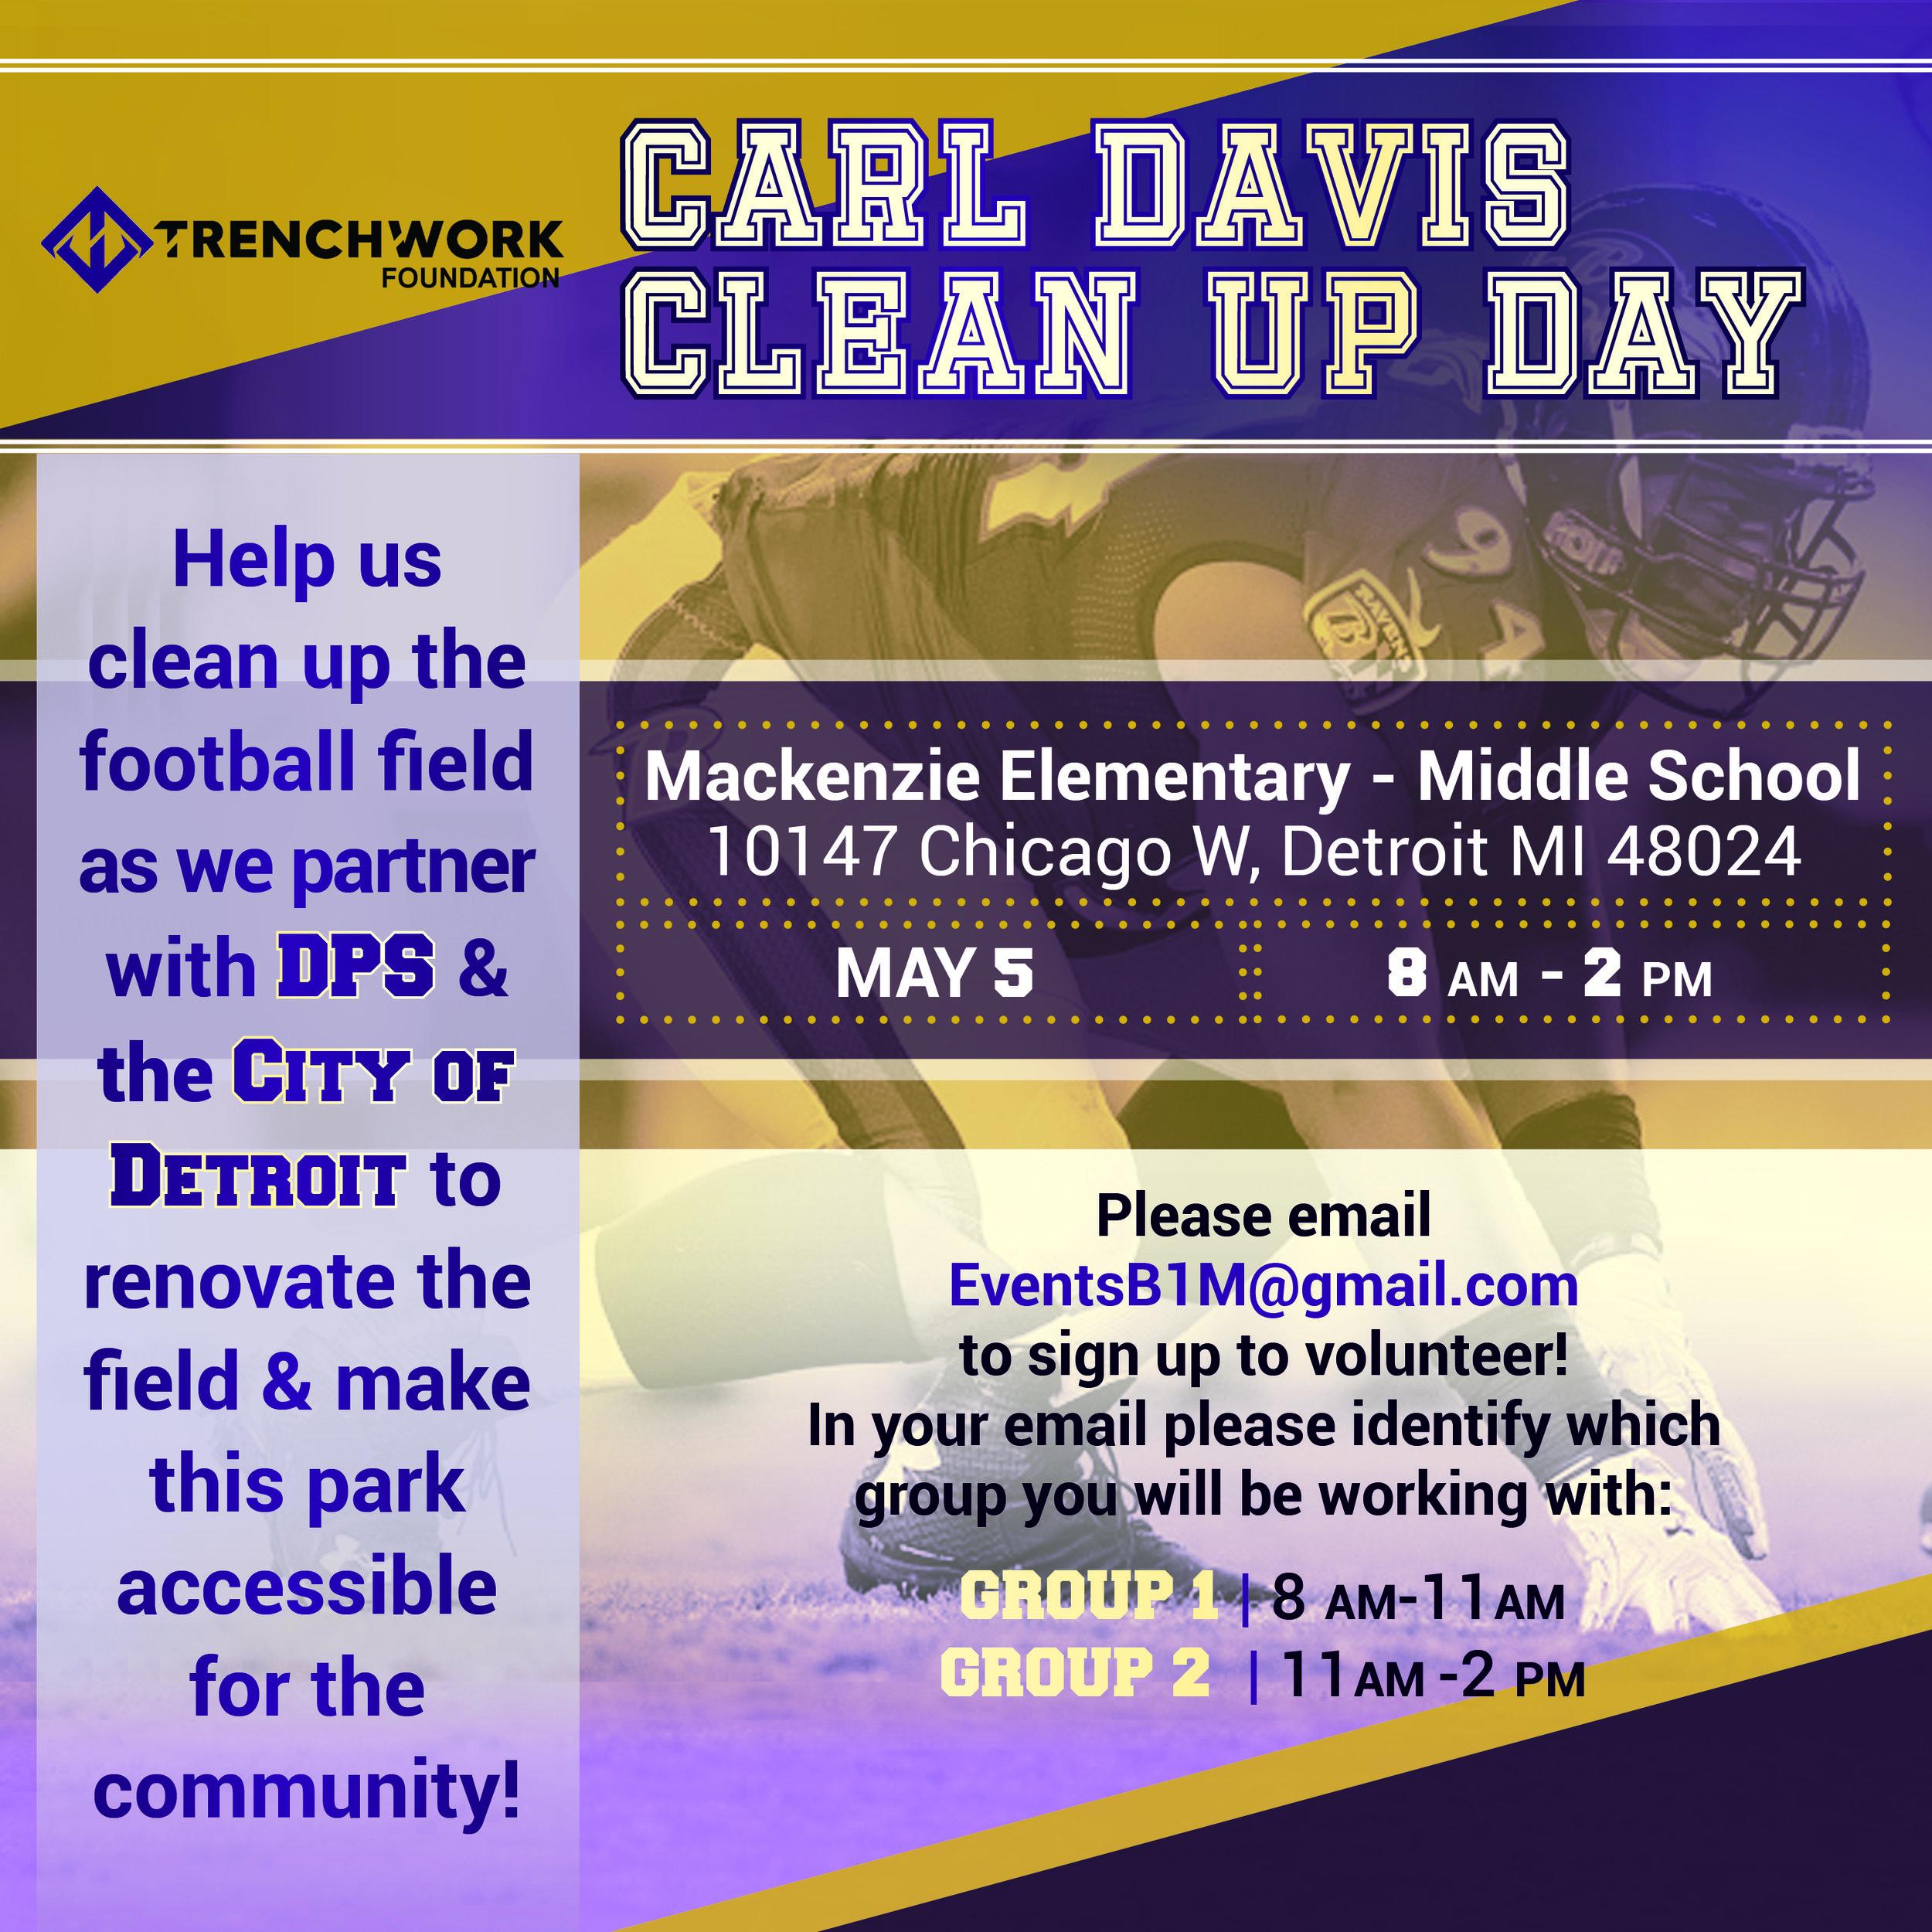 Carl Davis Clean Up Day